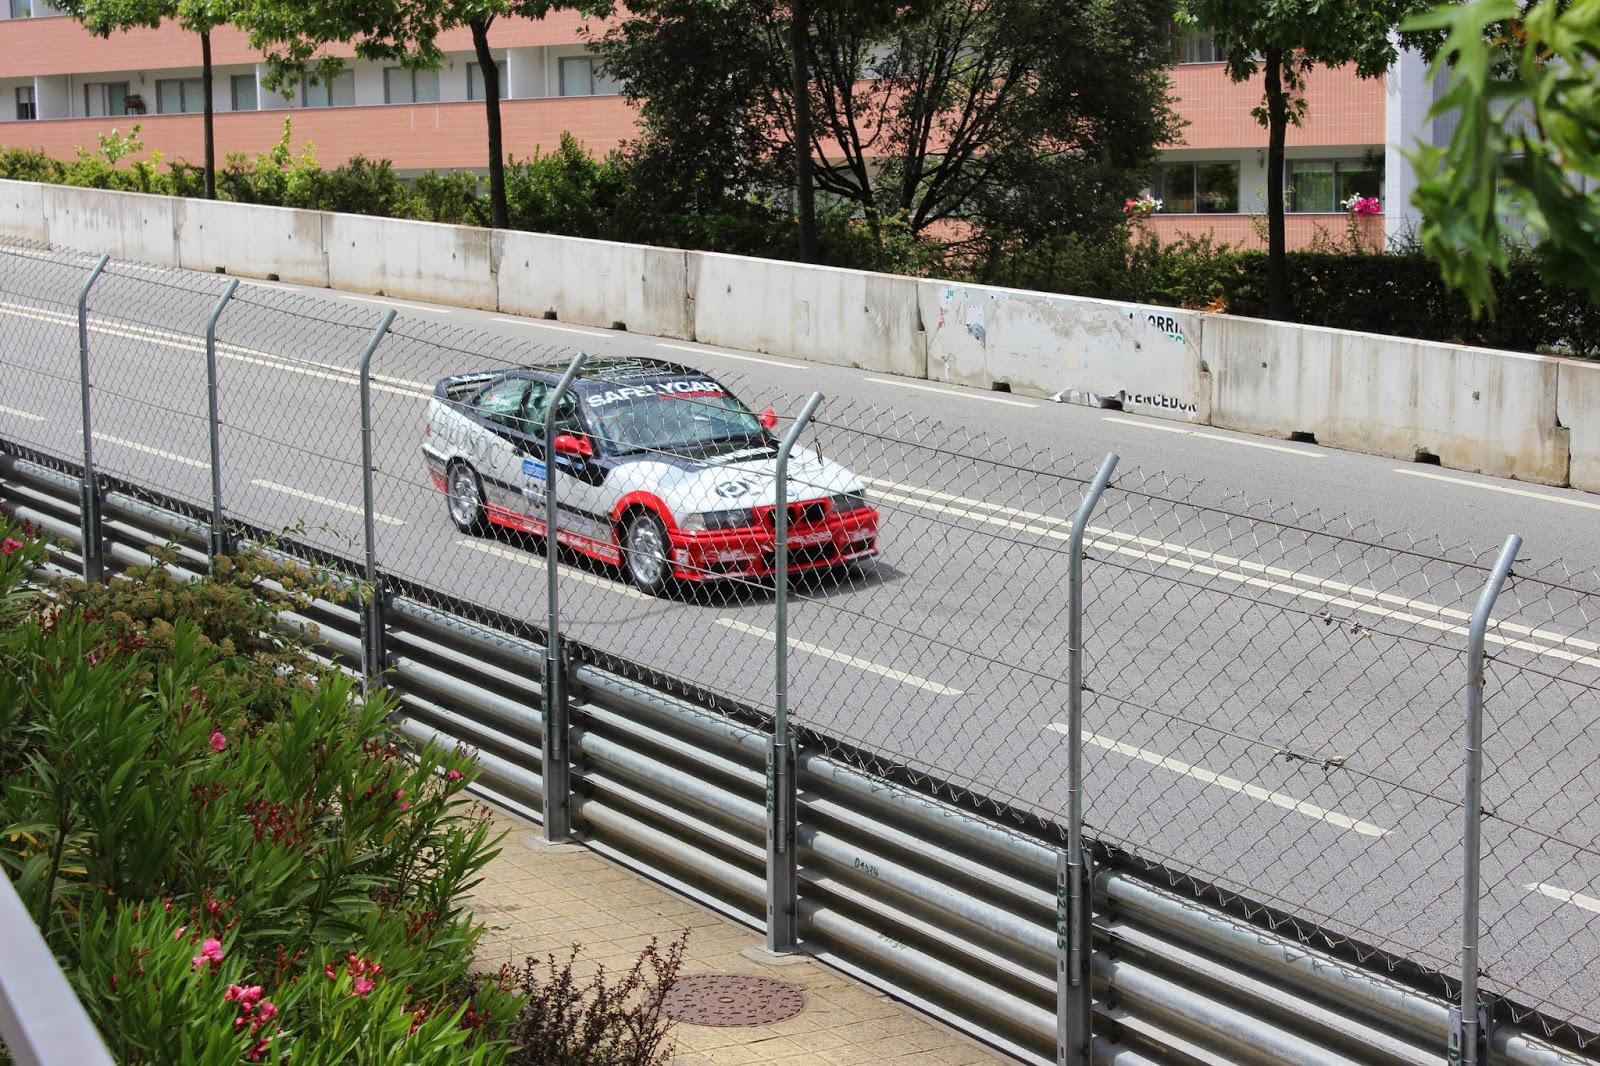 Circuito Vila Real : Chicane circuito de vila real regresso do citadino de